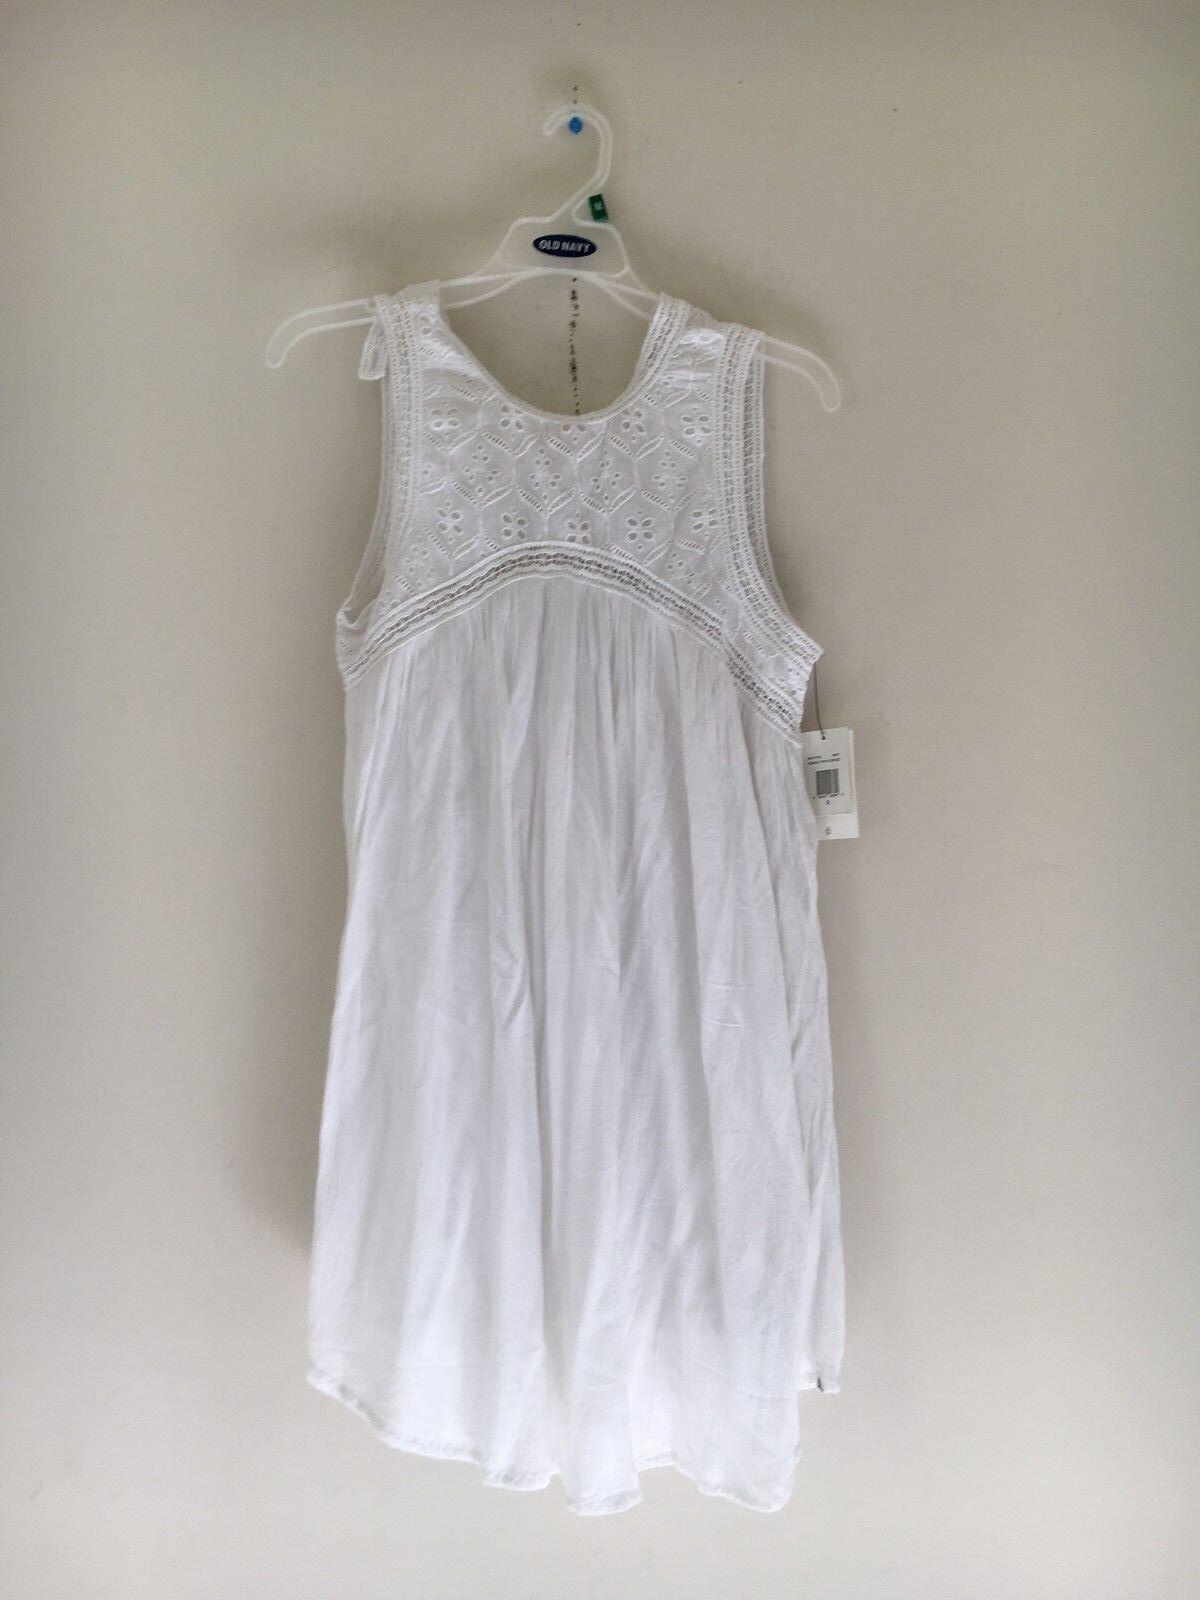 NWT VOLCOM Women's Stylish White Lace Dress 100% COTTON SIZE S